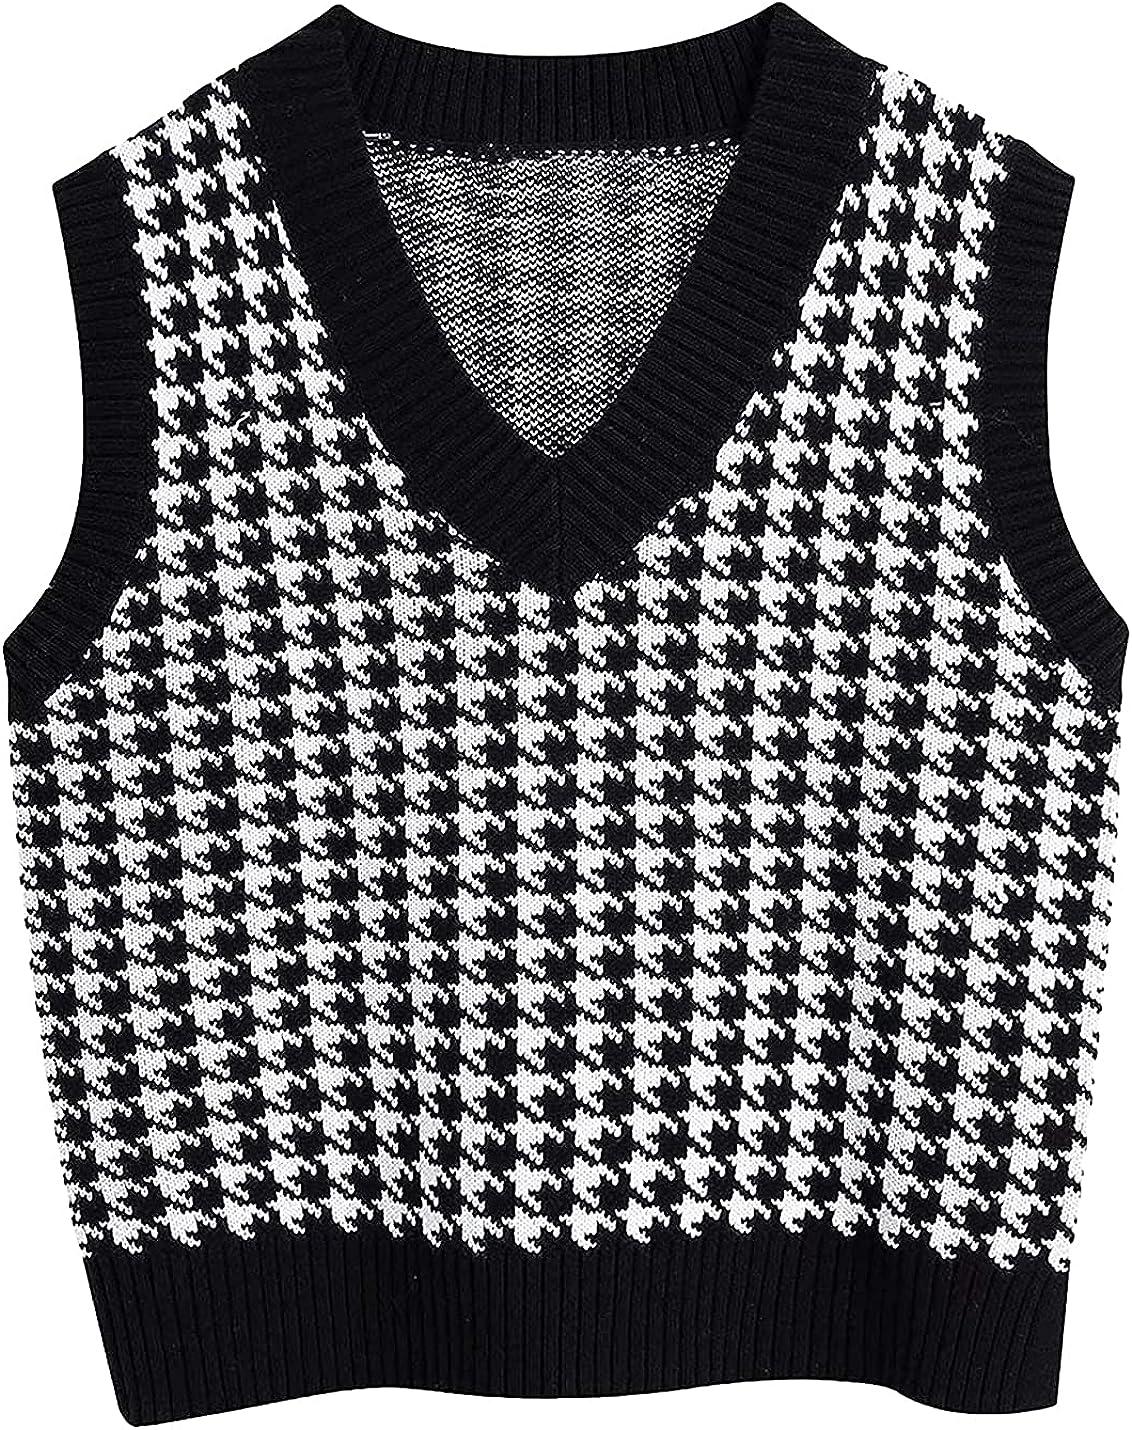 Peaceglad Womens V Neck Sweater Vest Houndstooth Pattern Knit Sleeveless Loose Uniform Waistcoat Pollover Knitwear Tank Tops